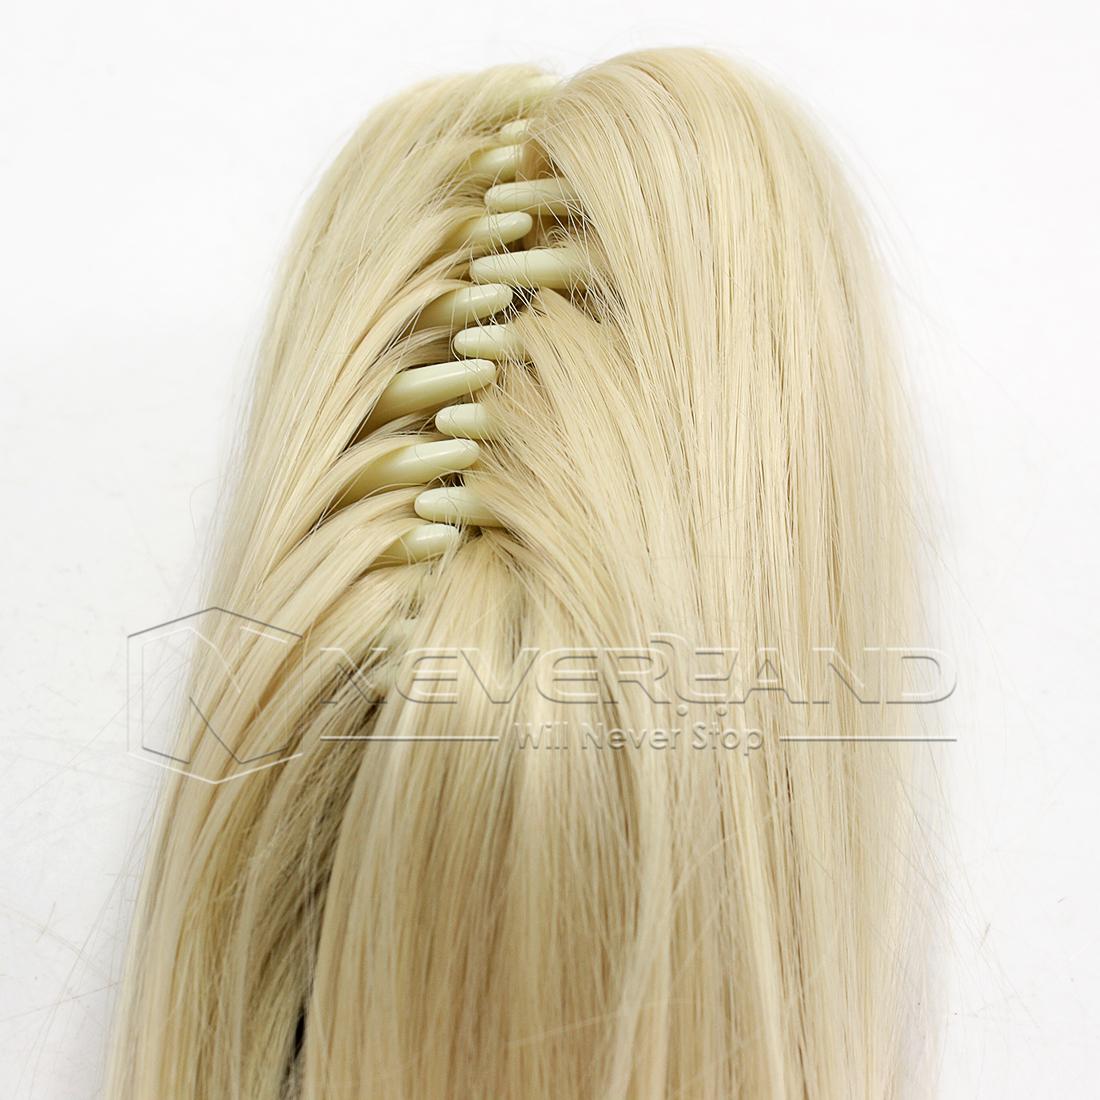 Human Hair Extensions Online Ebay 22